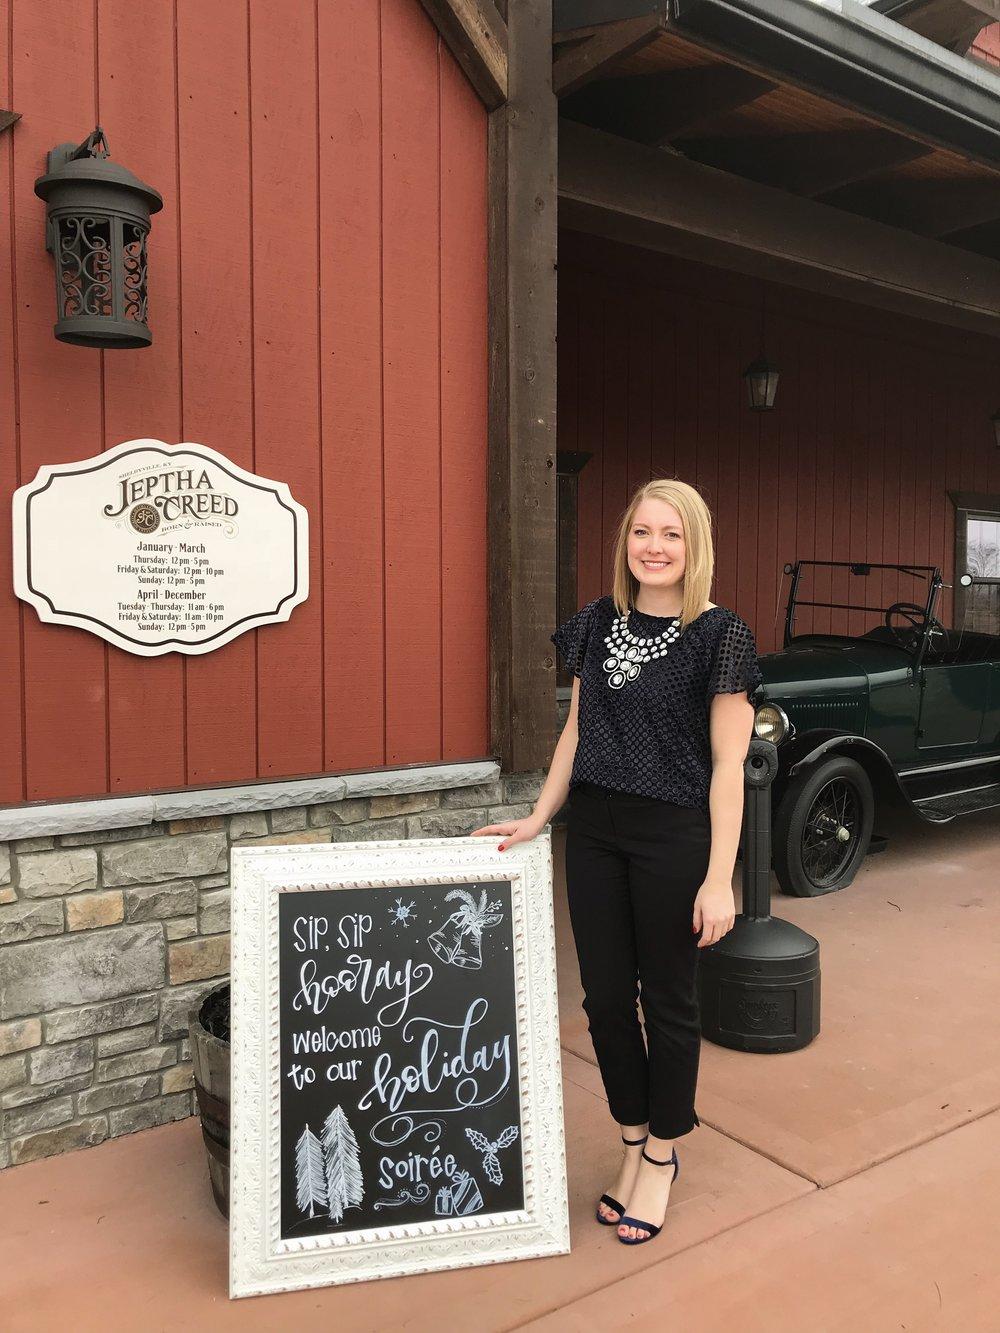 Sign by  Lexington Lettering  / Venue  Jeptha Creed Distillery  / Photo by Samantha Fletcher